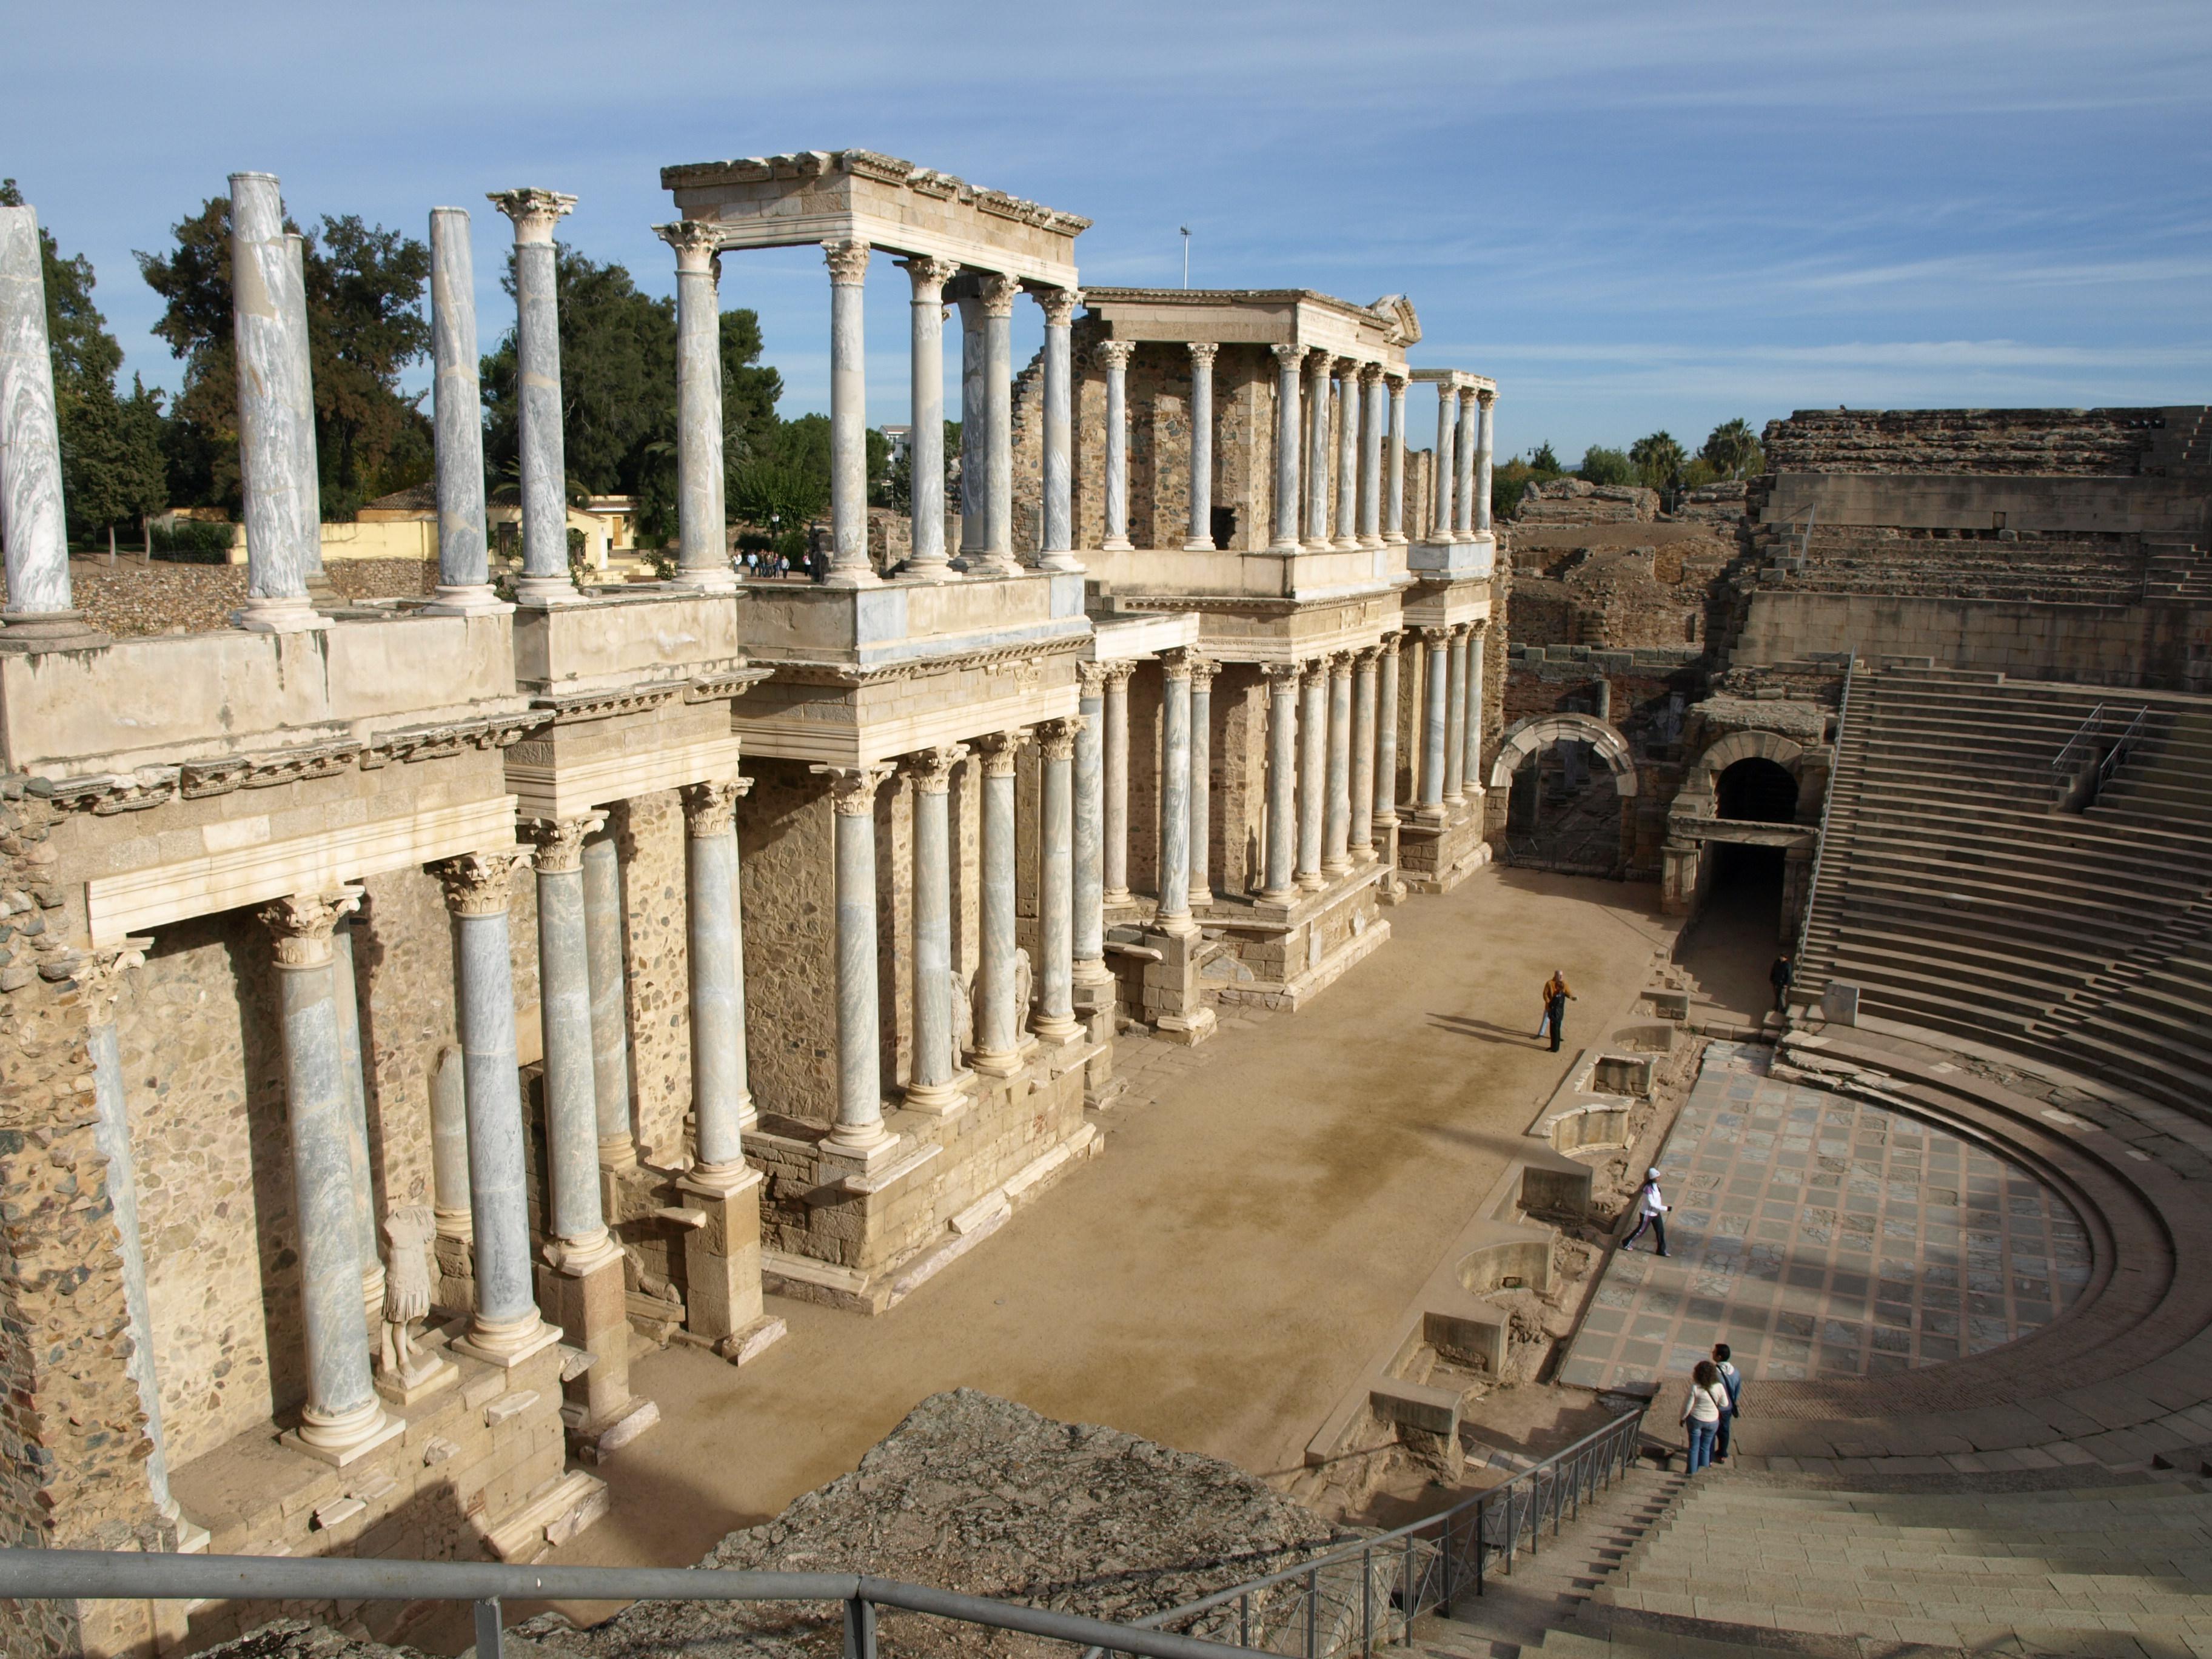 Baños Roma Obra De Teatro:Archivo:02Teatro romano (49)JPG – Wikipedia, la enciclopedia libre